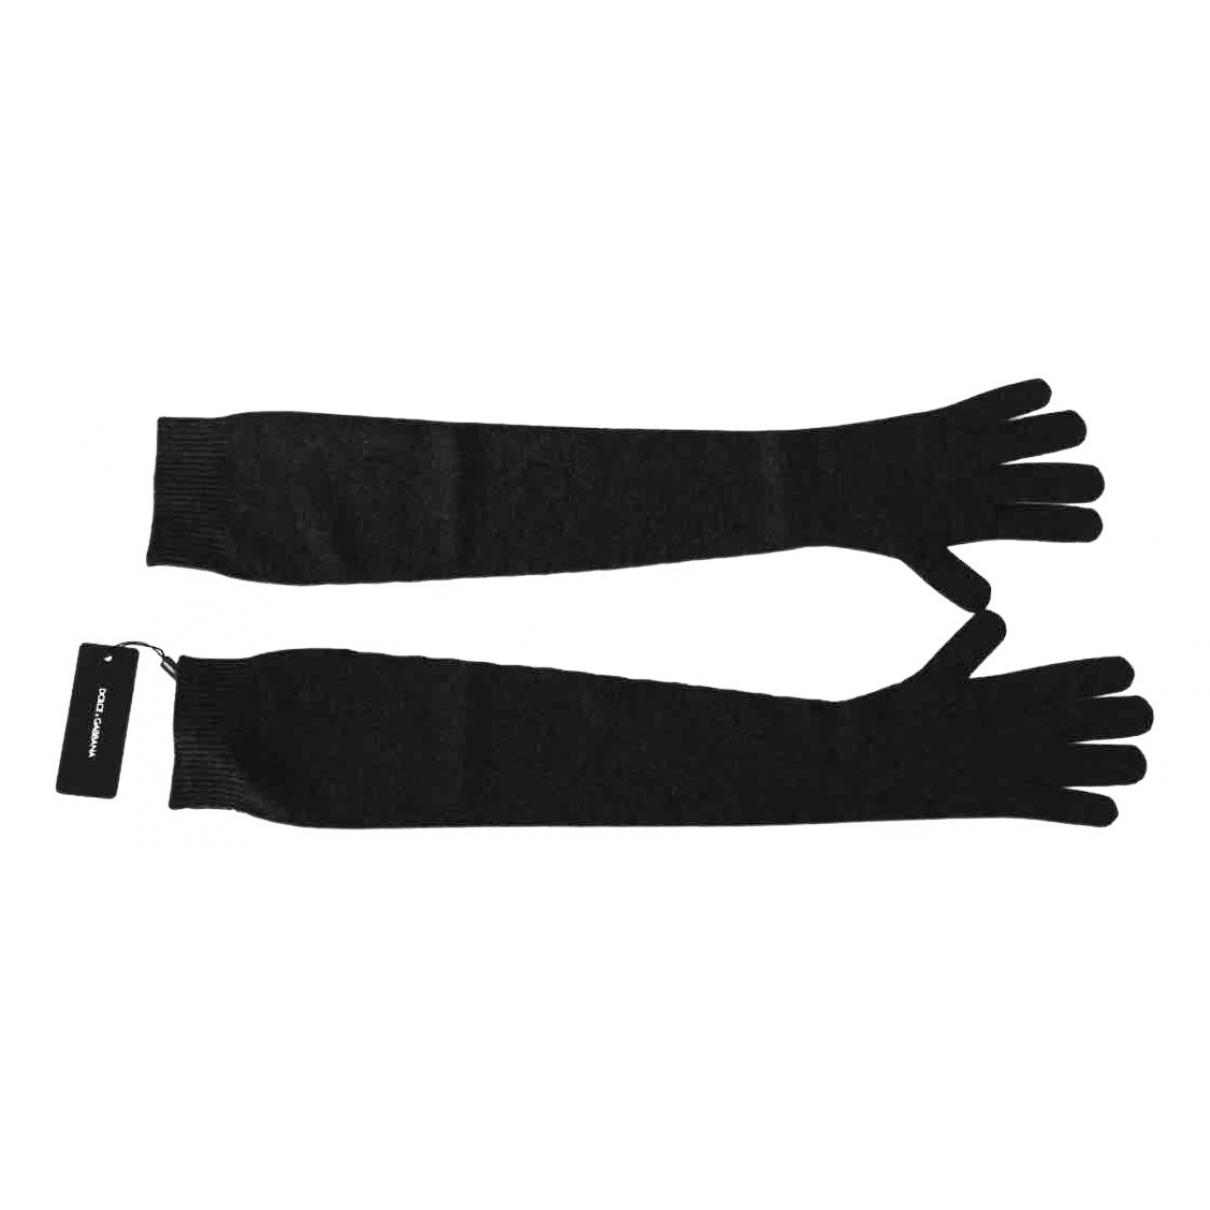 Dolce & Gabbana \N Black Cashmere Gloves for Women M International